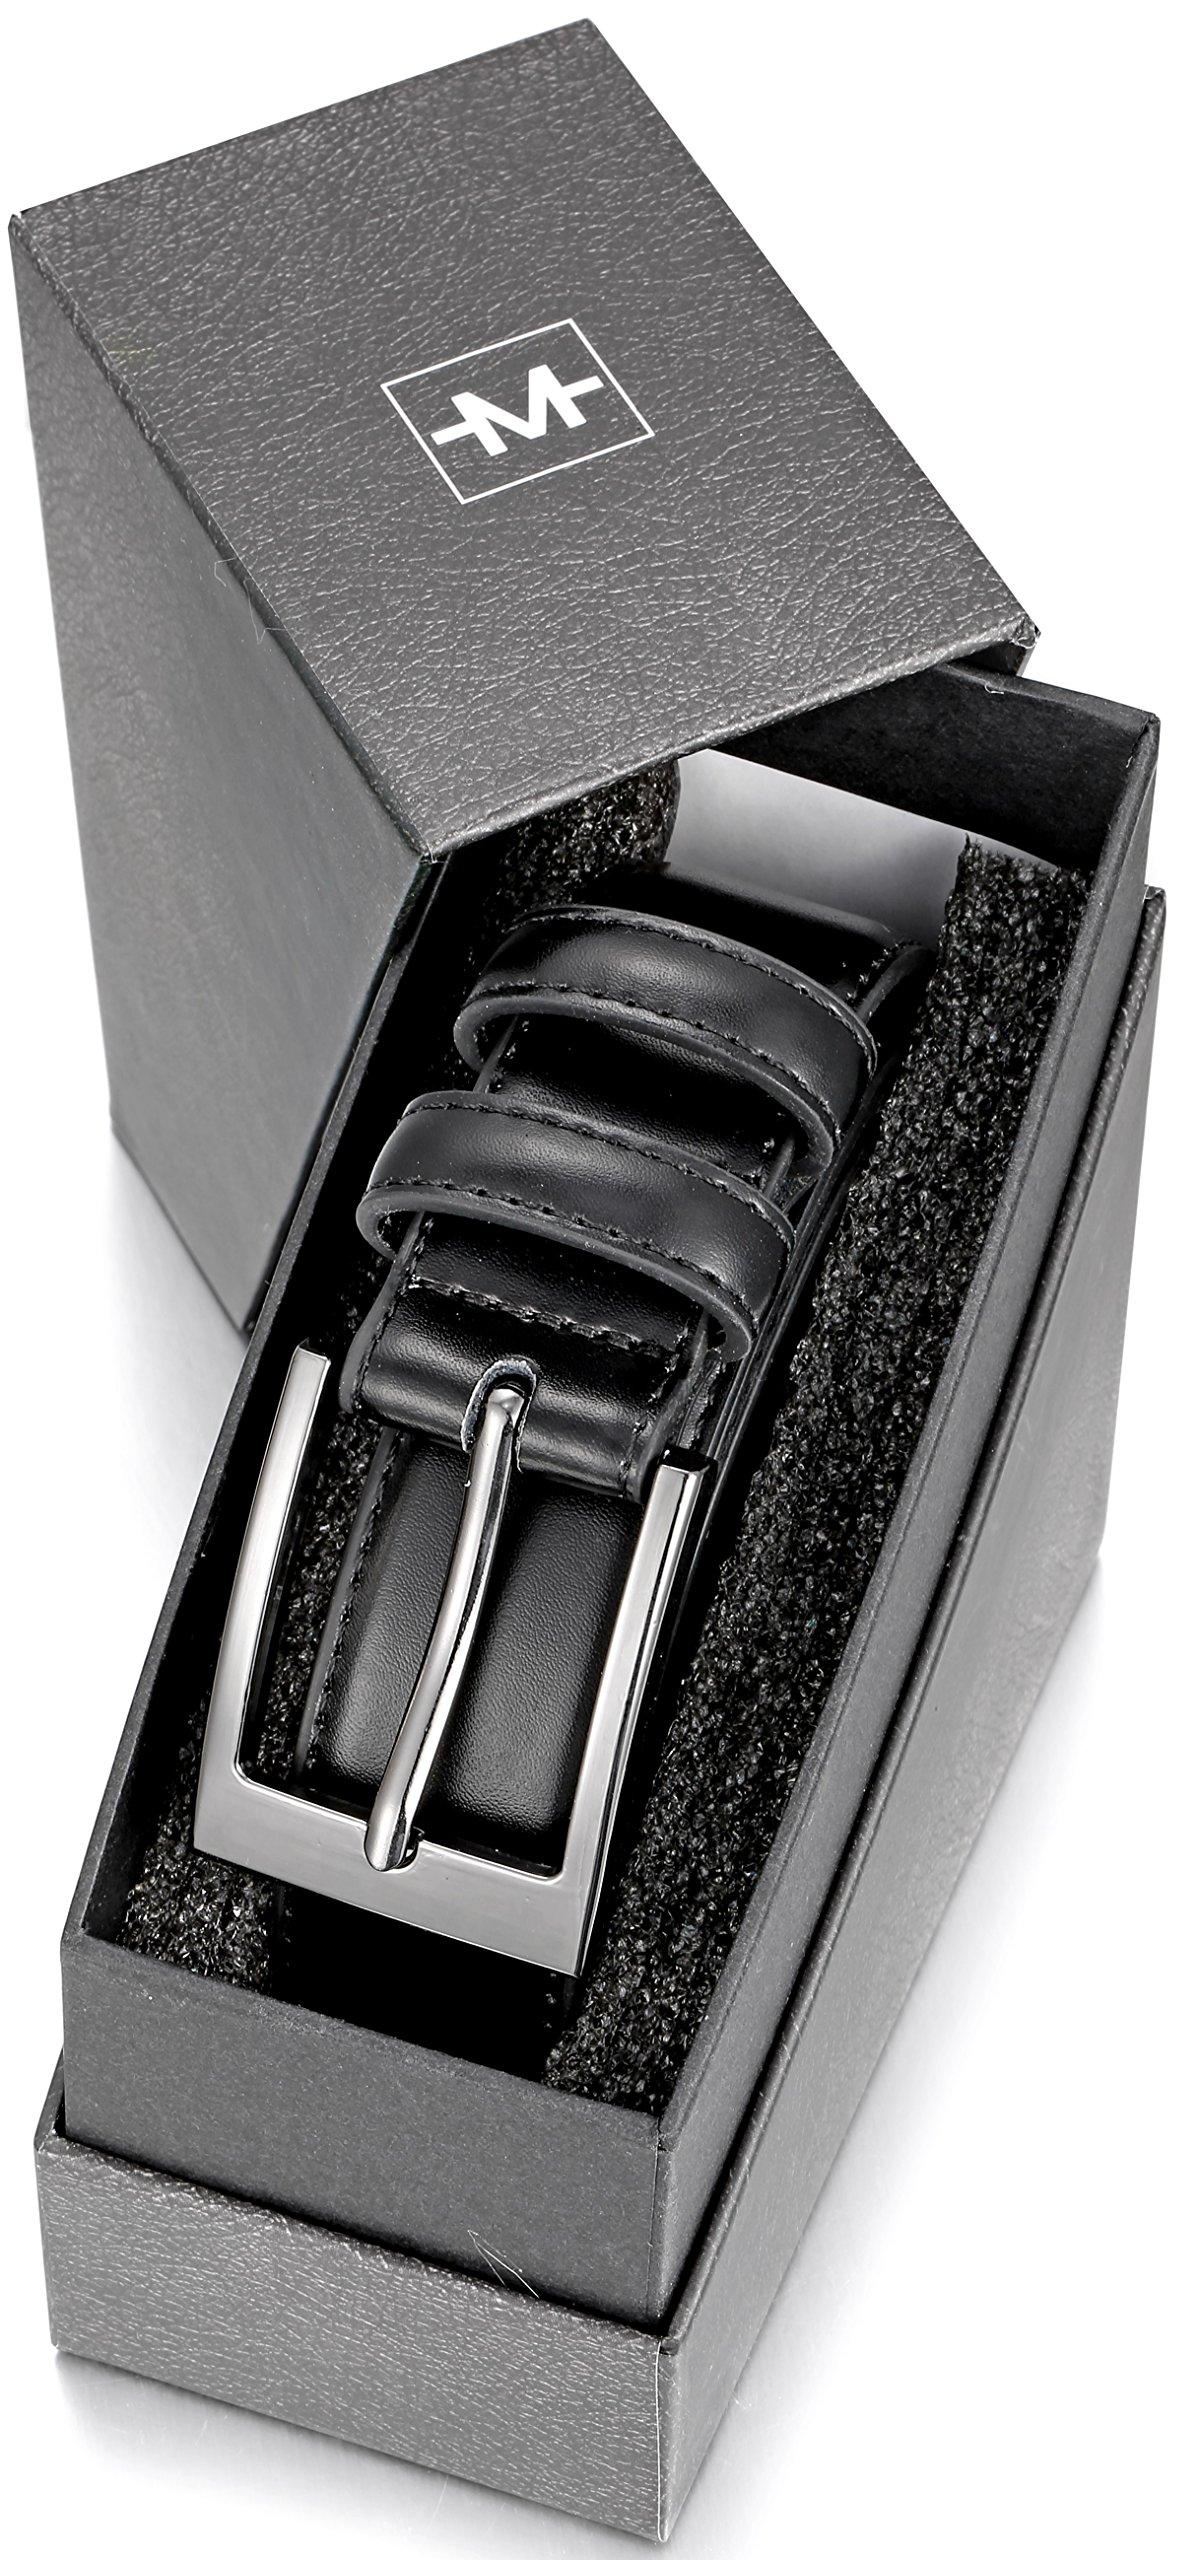 Marino's Men Genuine Leather Dress Belt with Single Prong Buckle - Black - 36 by Marino Avenue (Image #6)